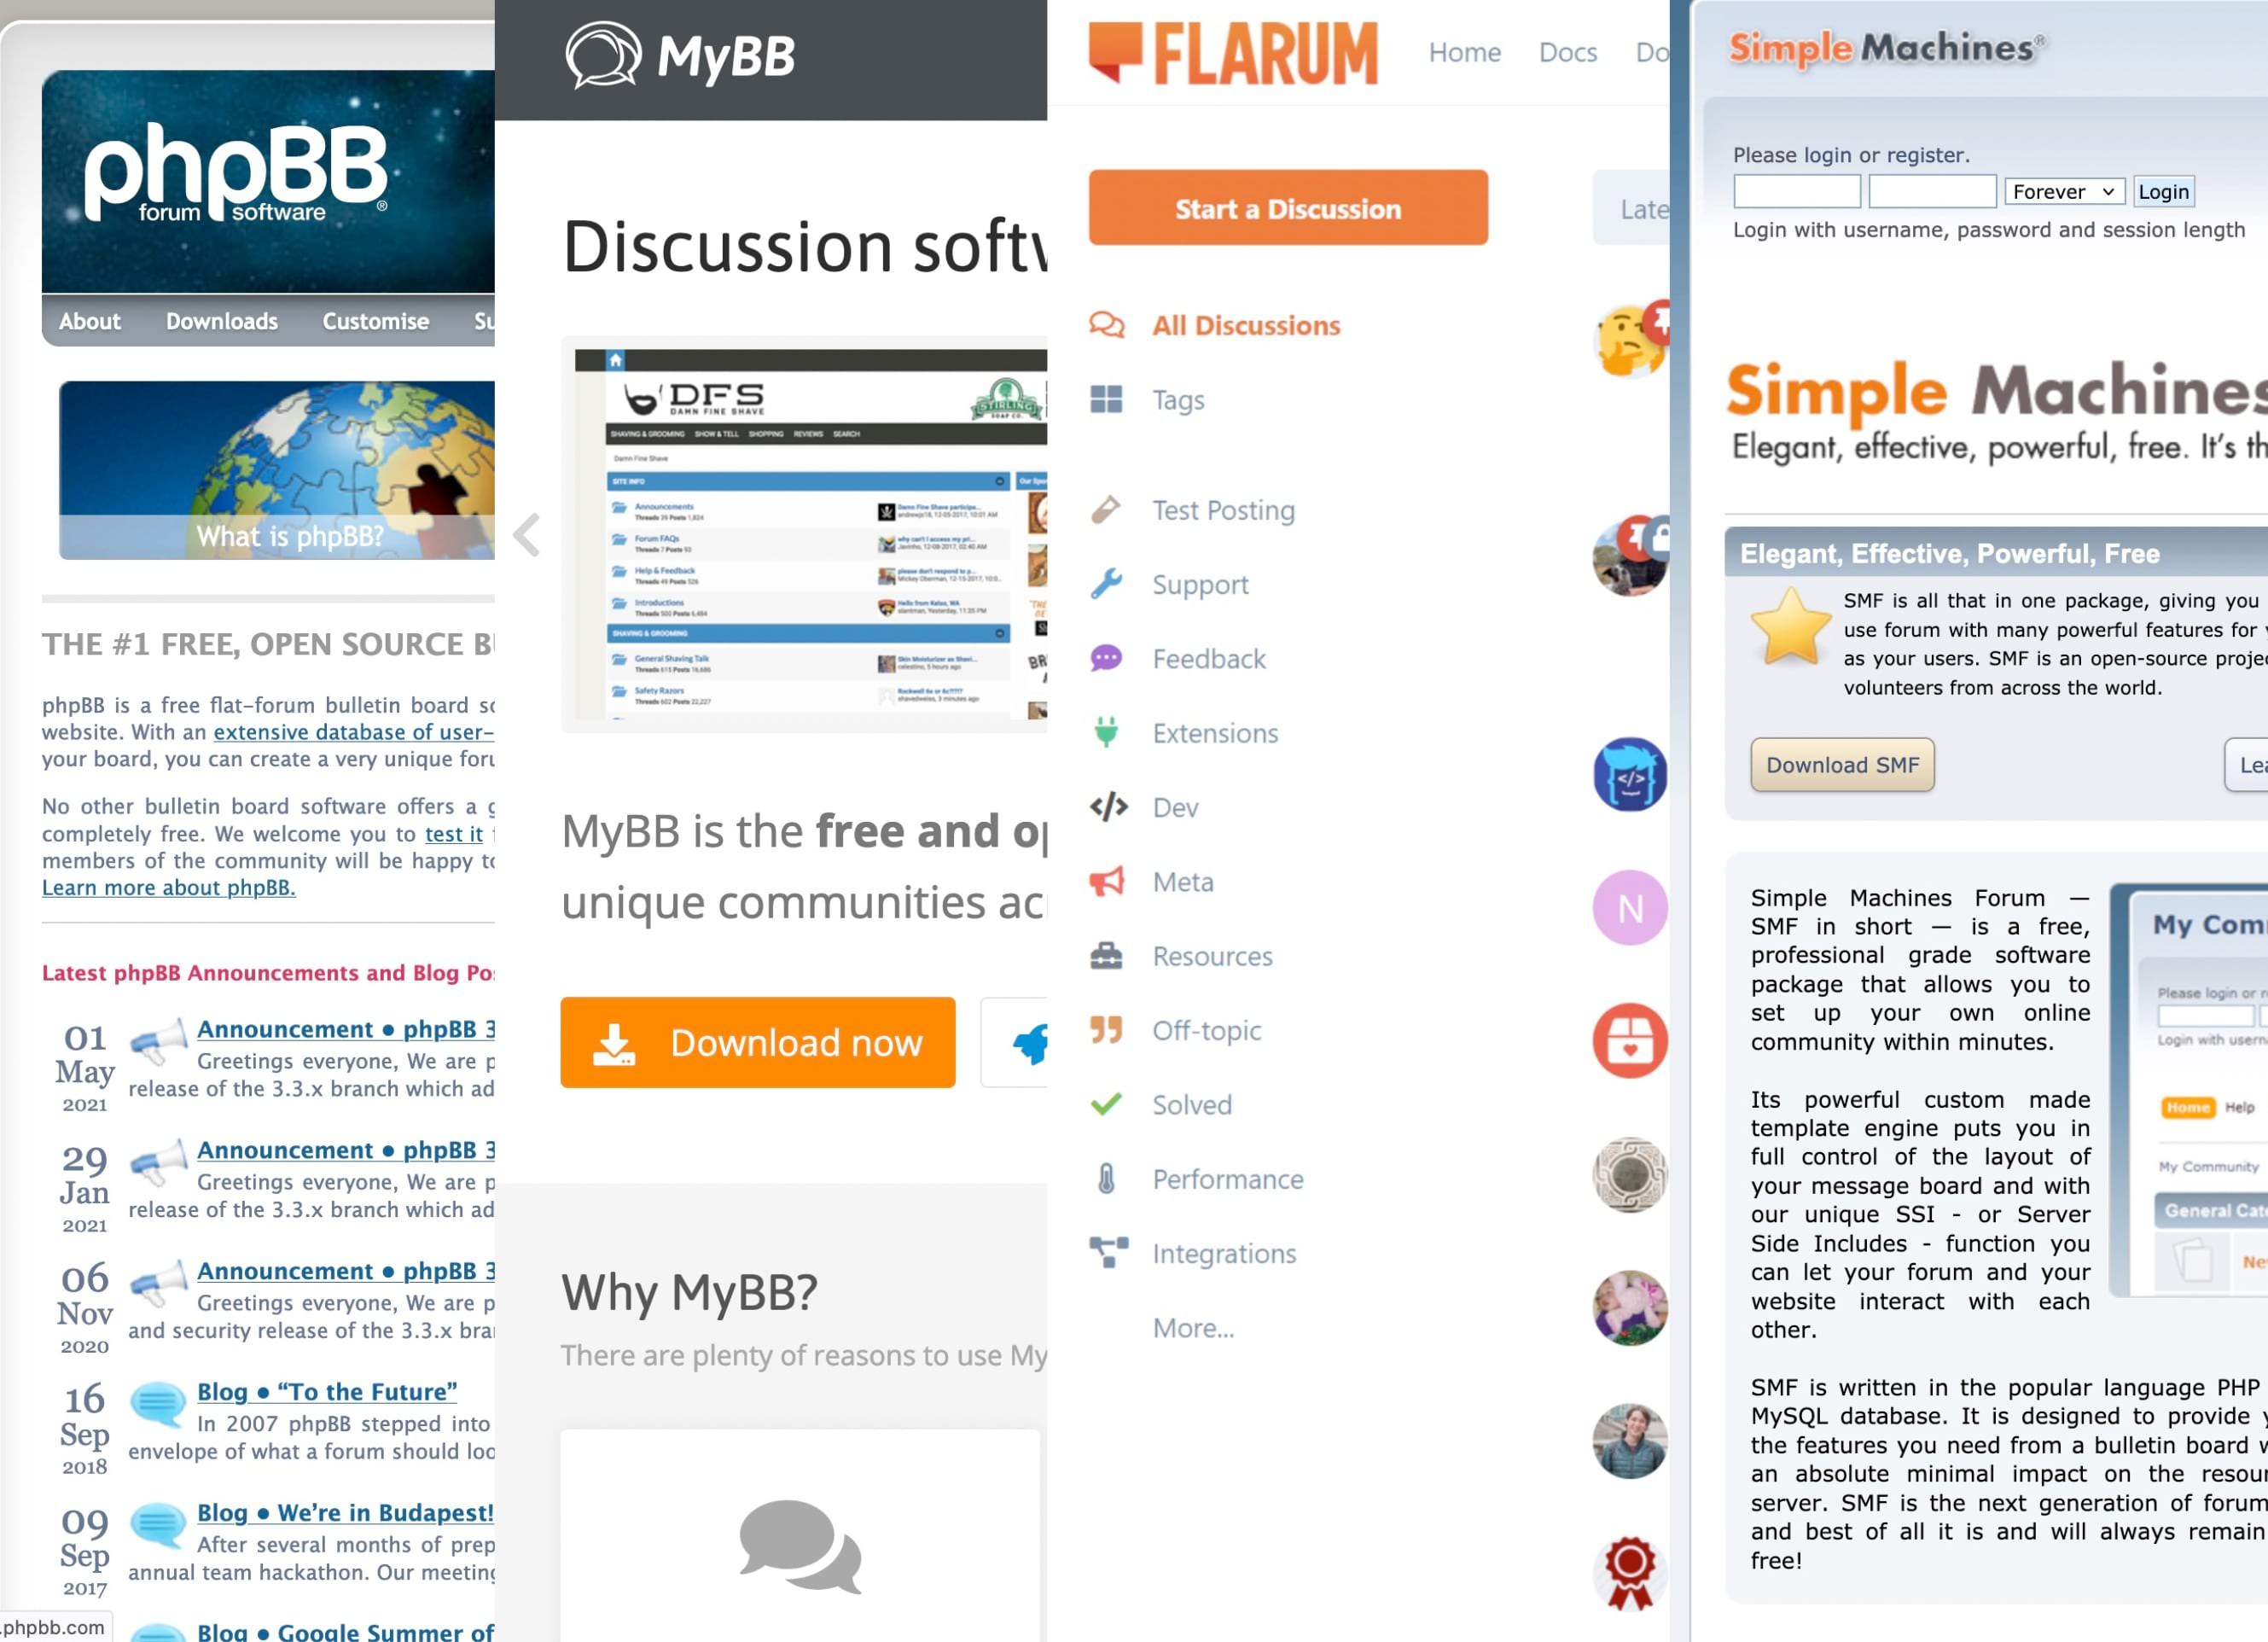 Compatibilidad con software para foros, phpBB, vBulletin, Flarum